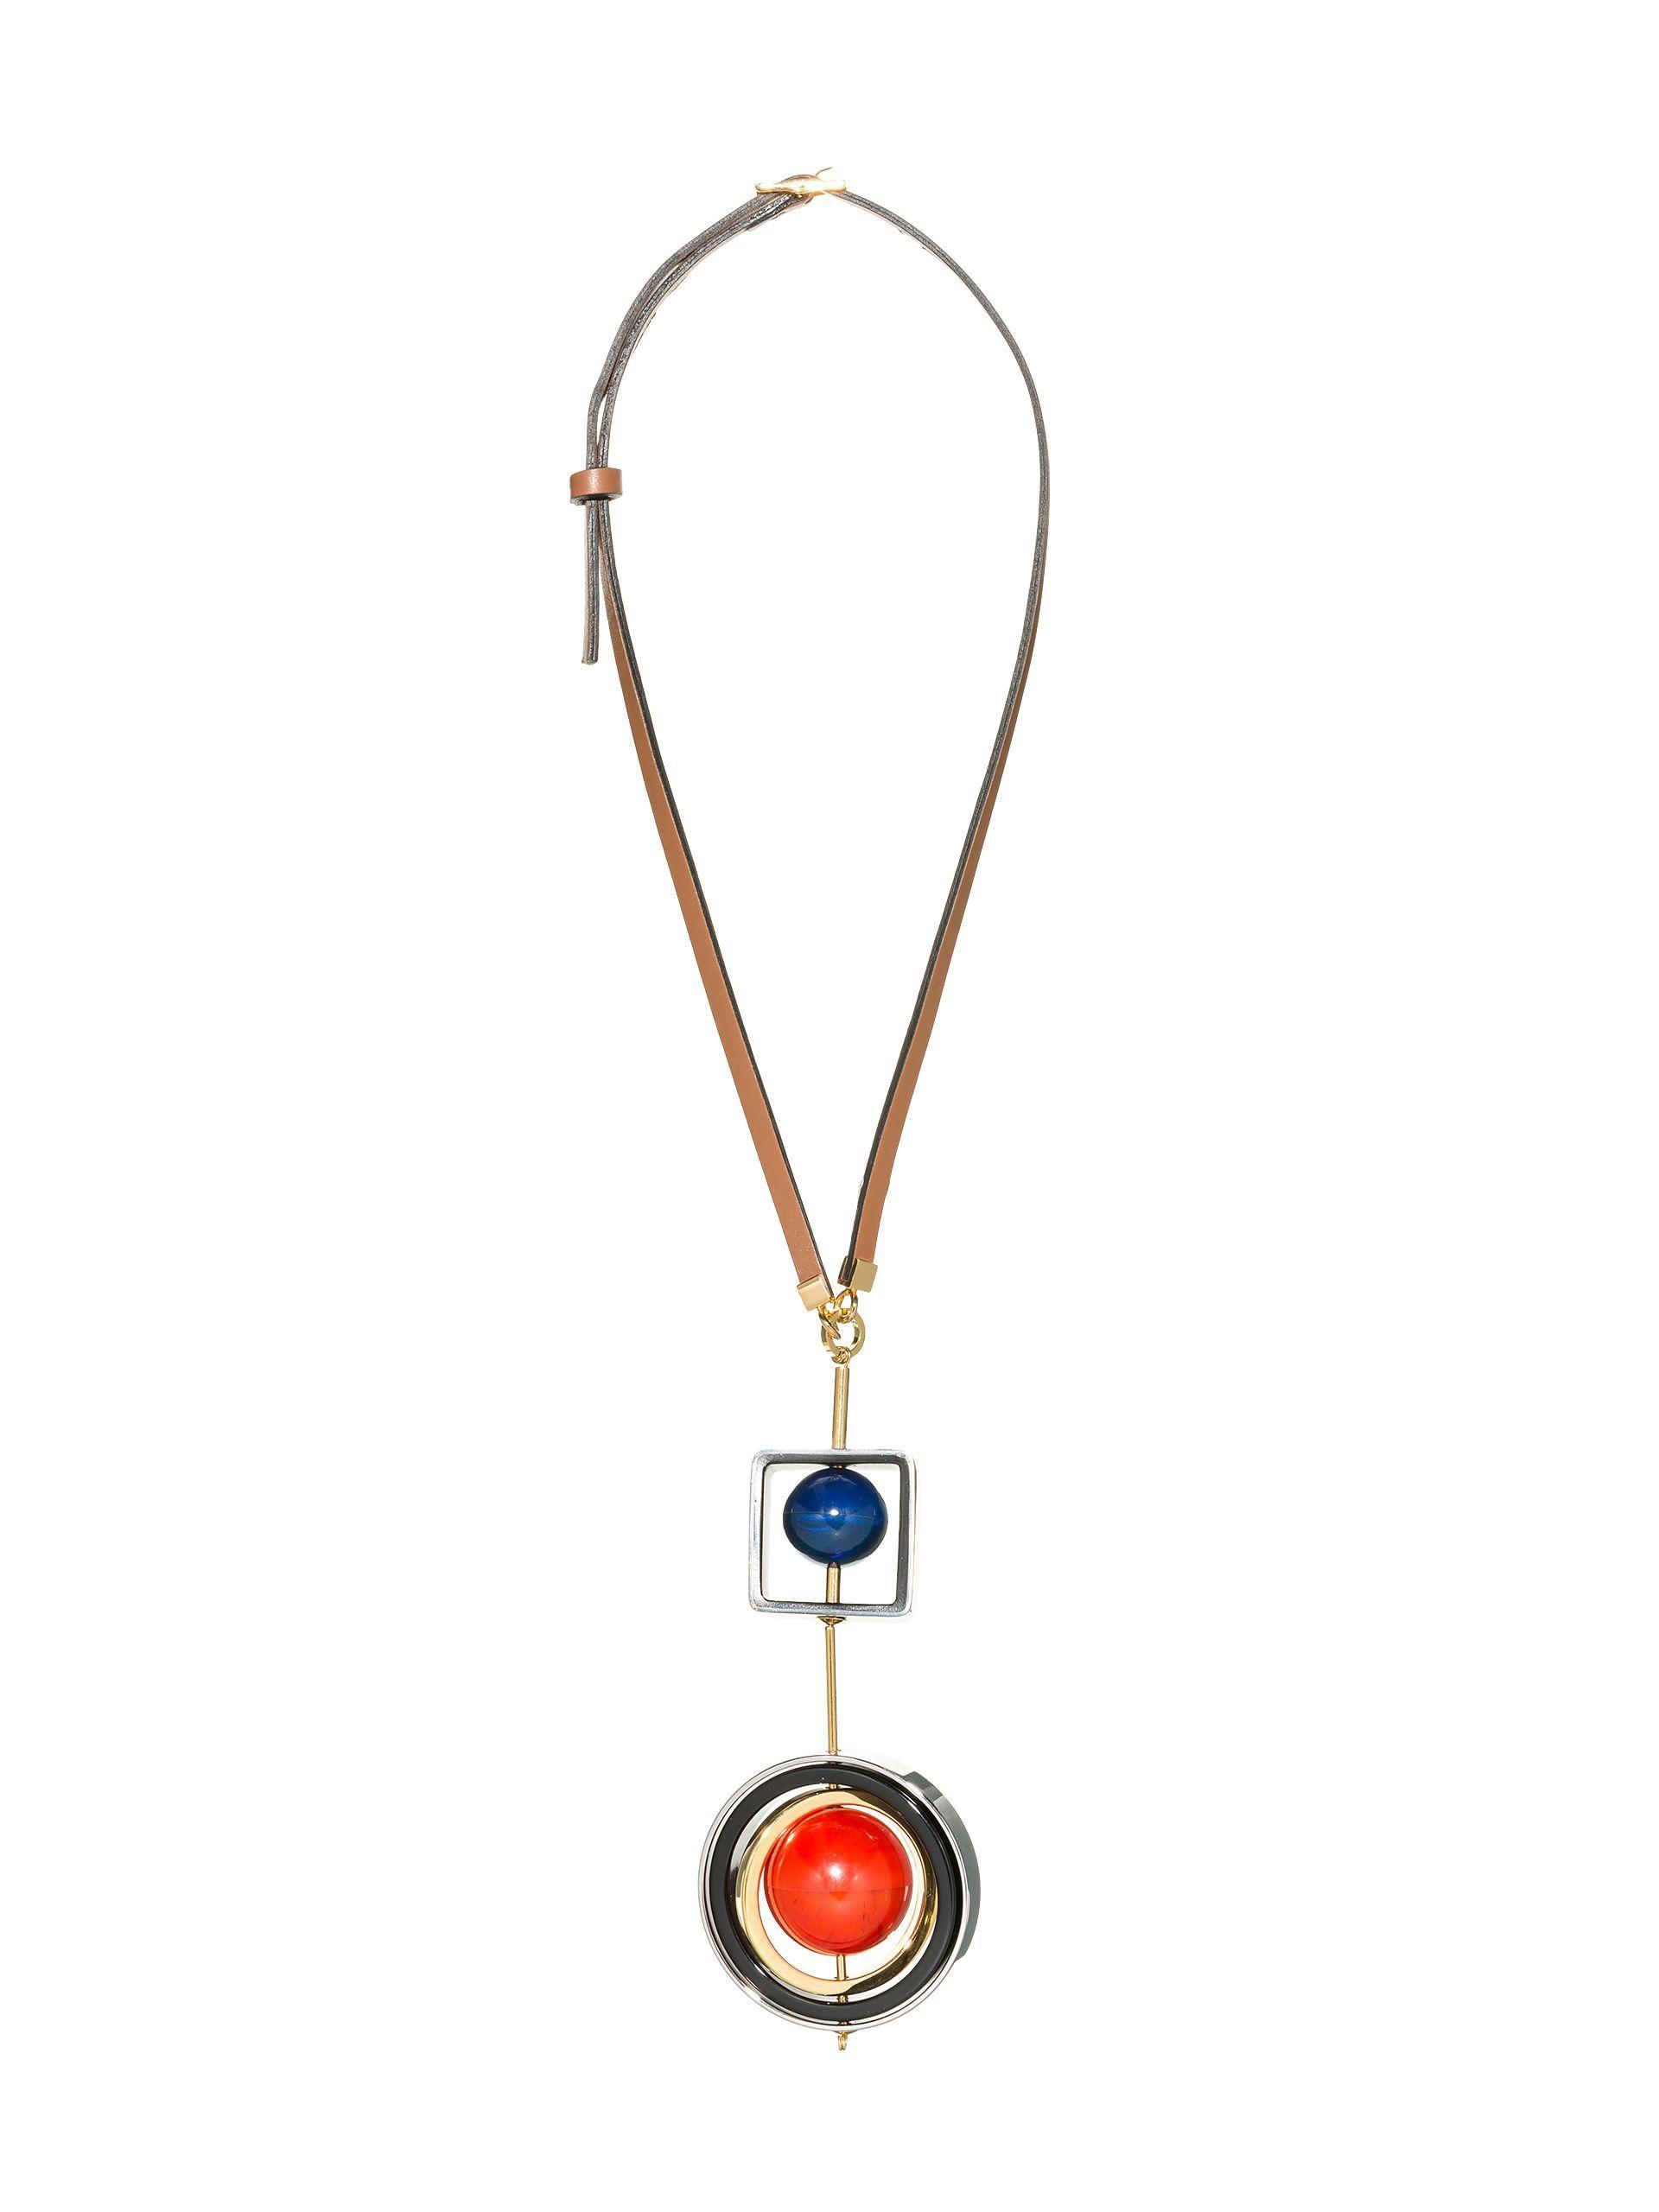 Marni geometric shapes double necklace - Metallic rqRyjRYN